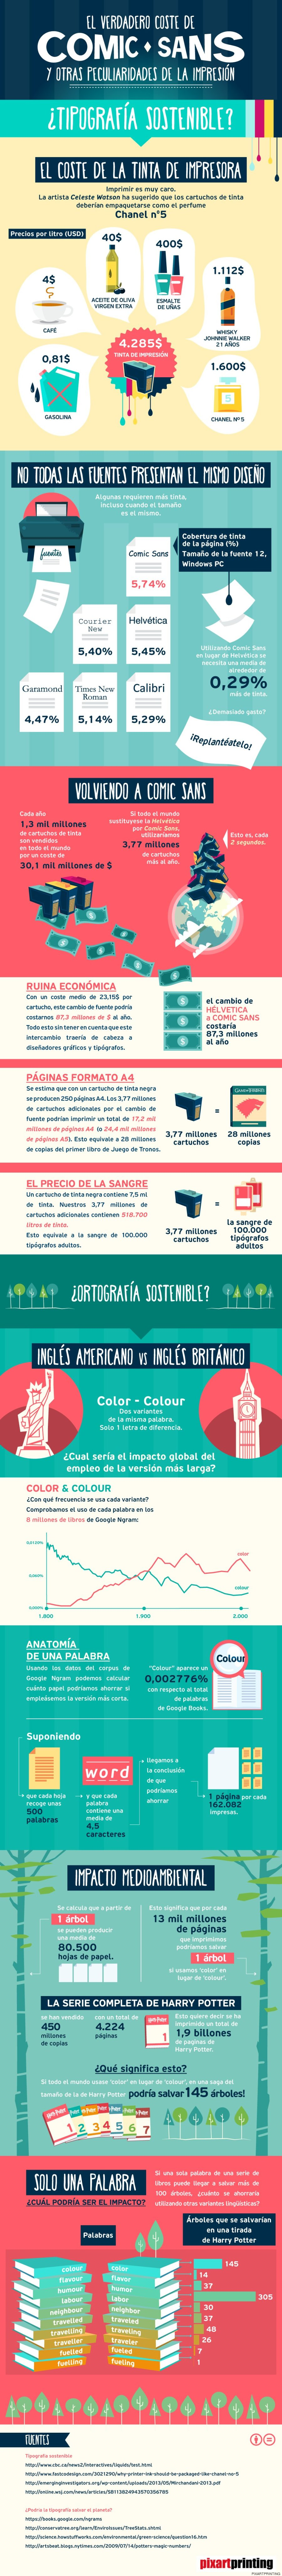 infografia comic sans